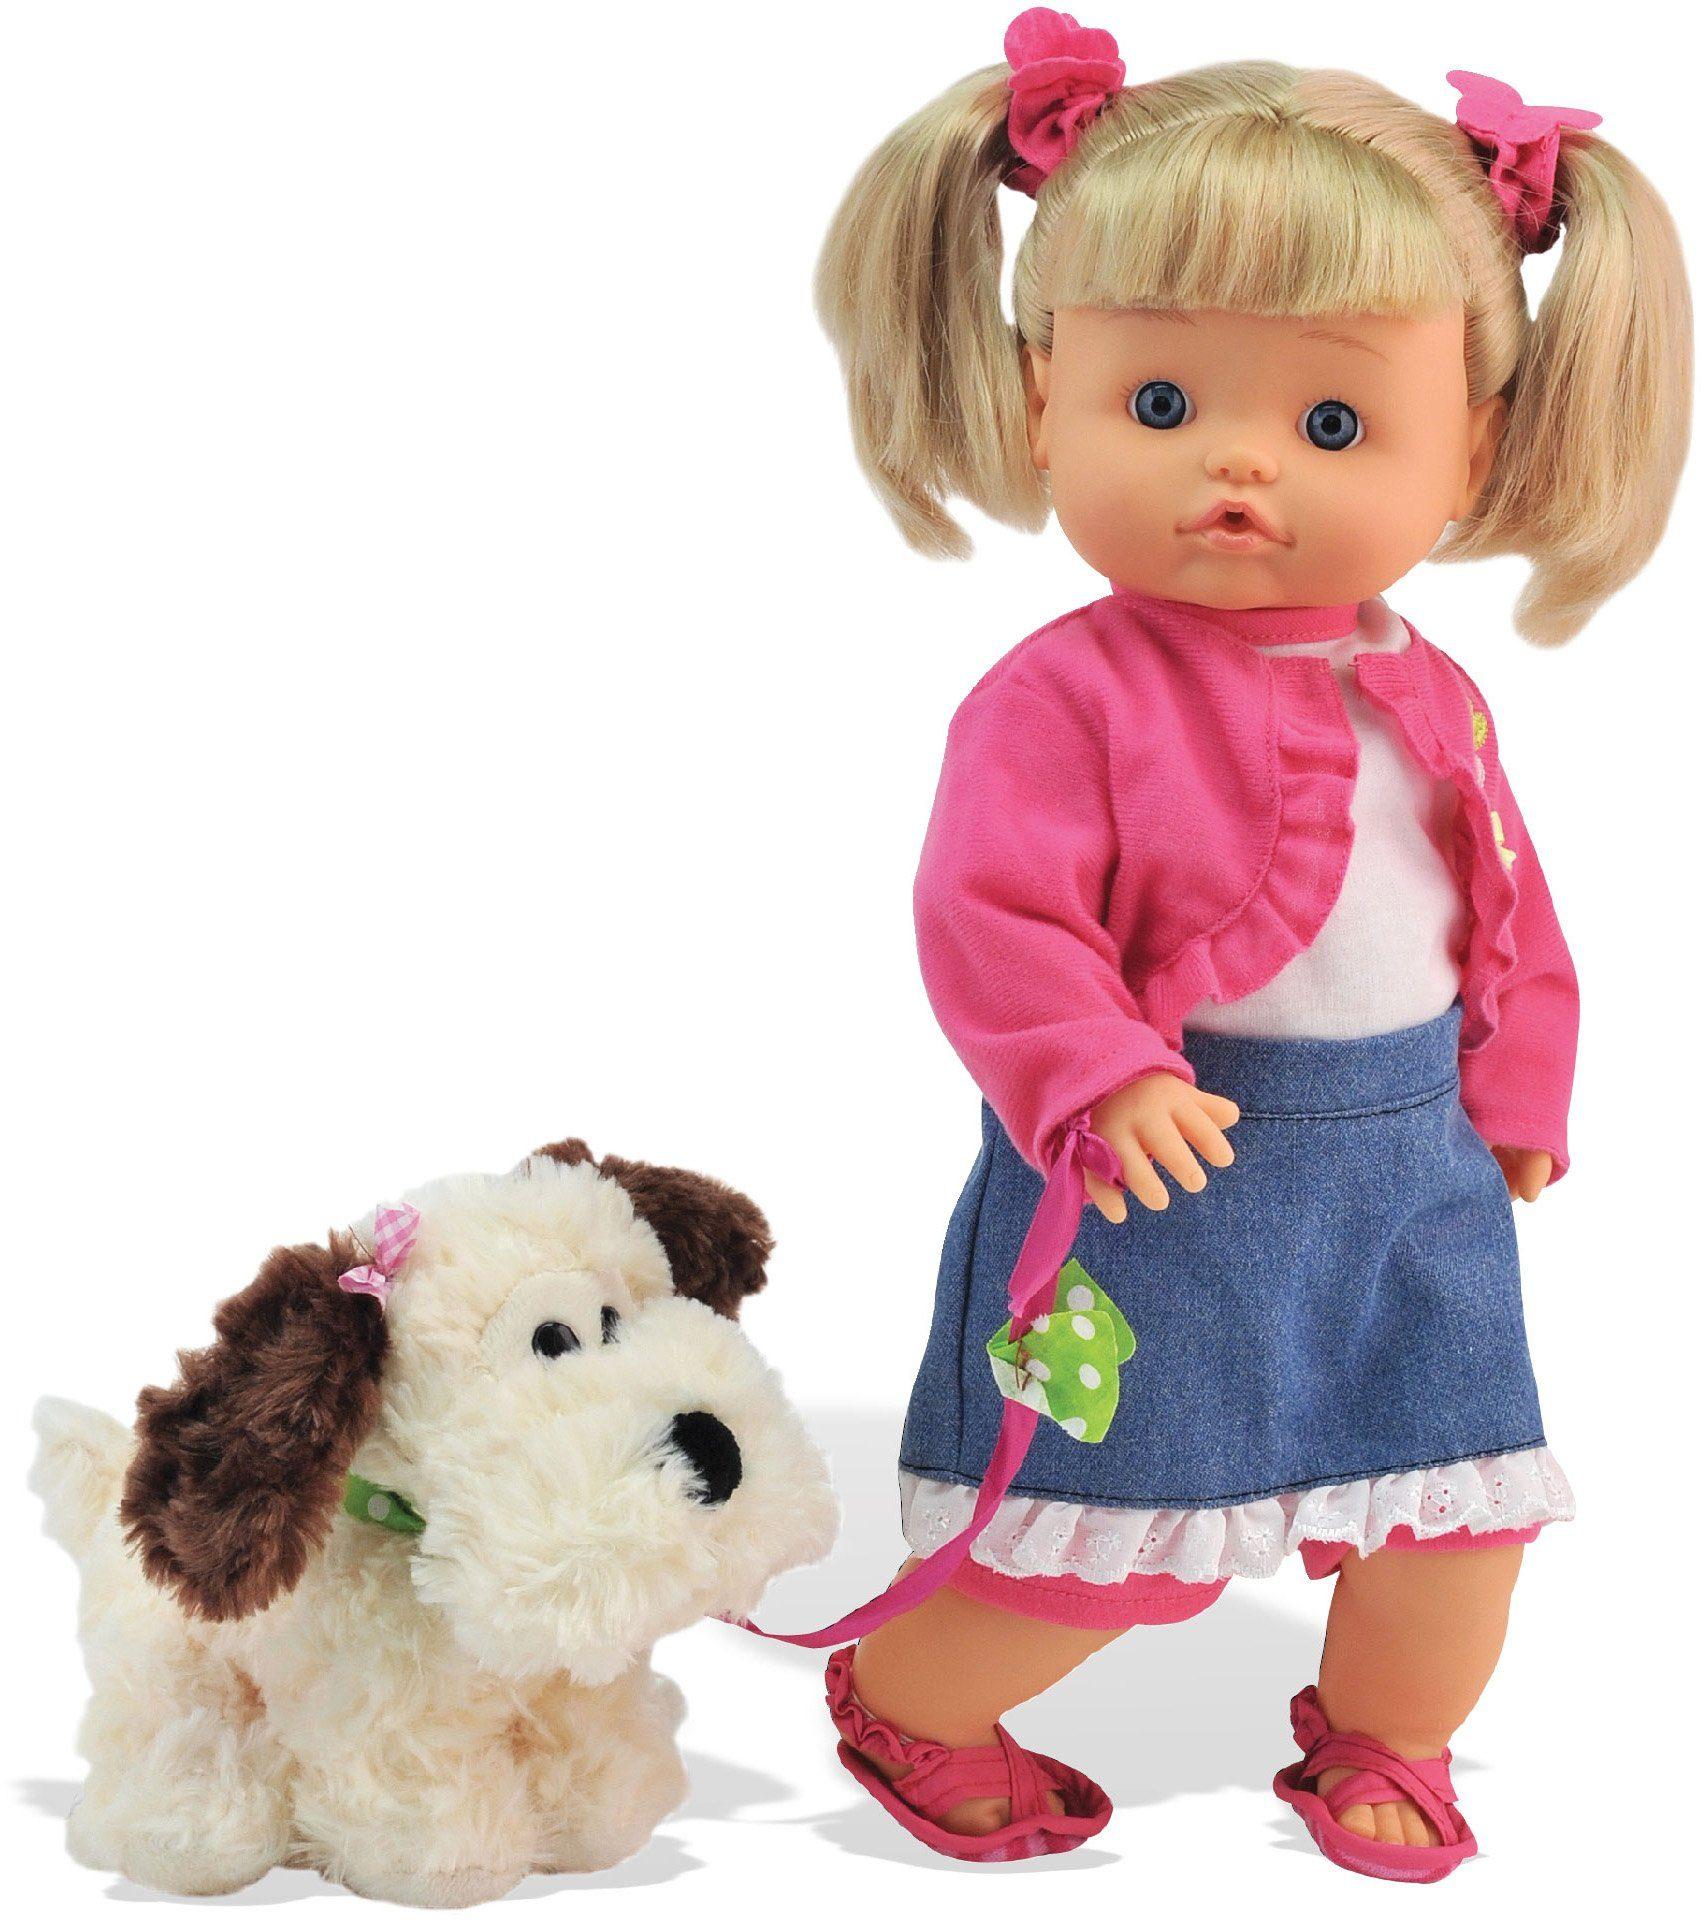 Dimian Puppe mit Stofftier Hund, »Bambolina Nena Pipì Popò Puppe«